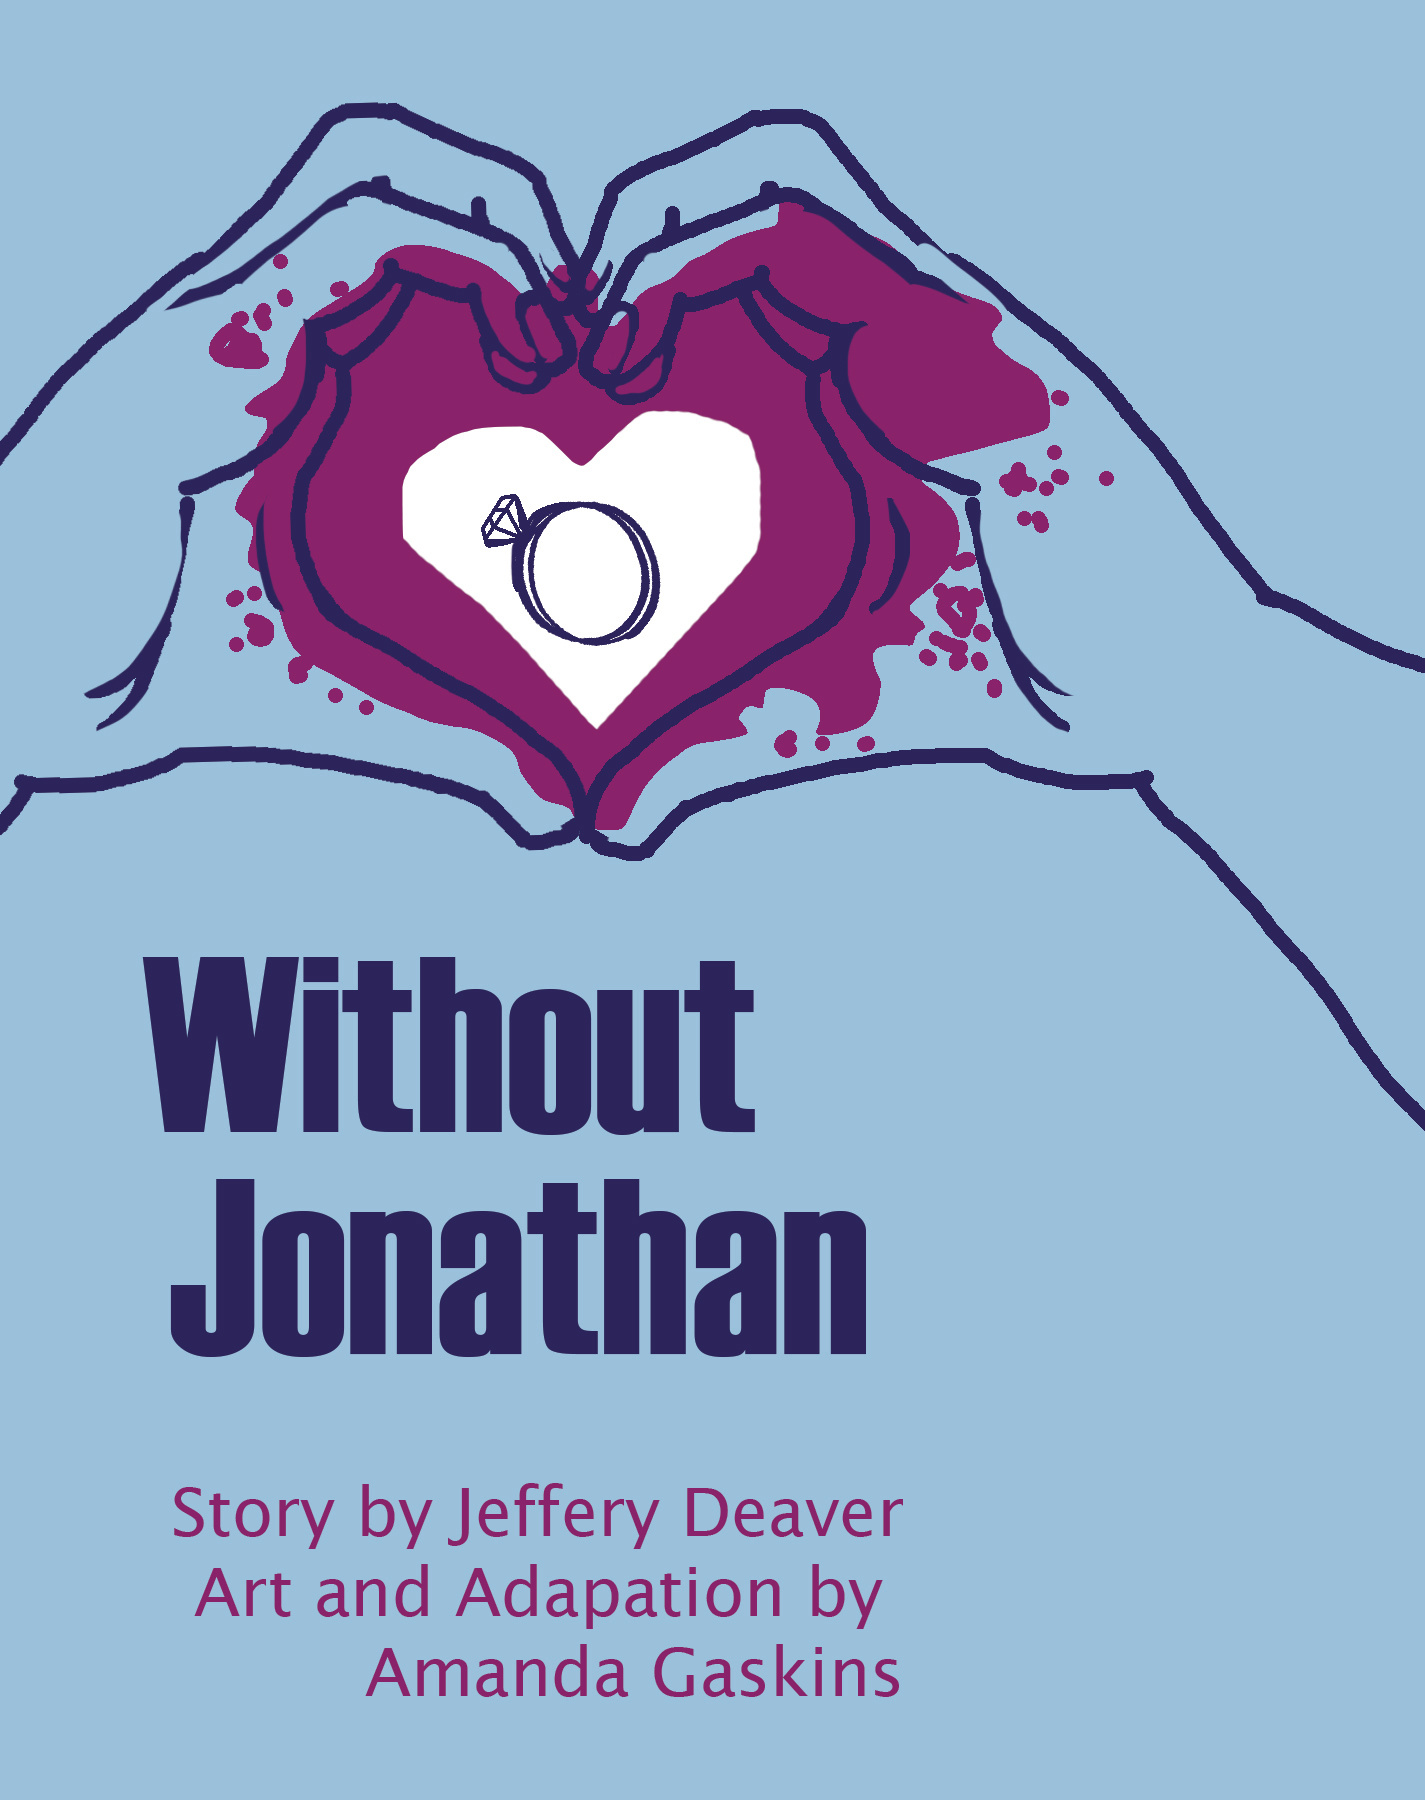 Without Jonathan